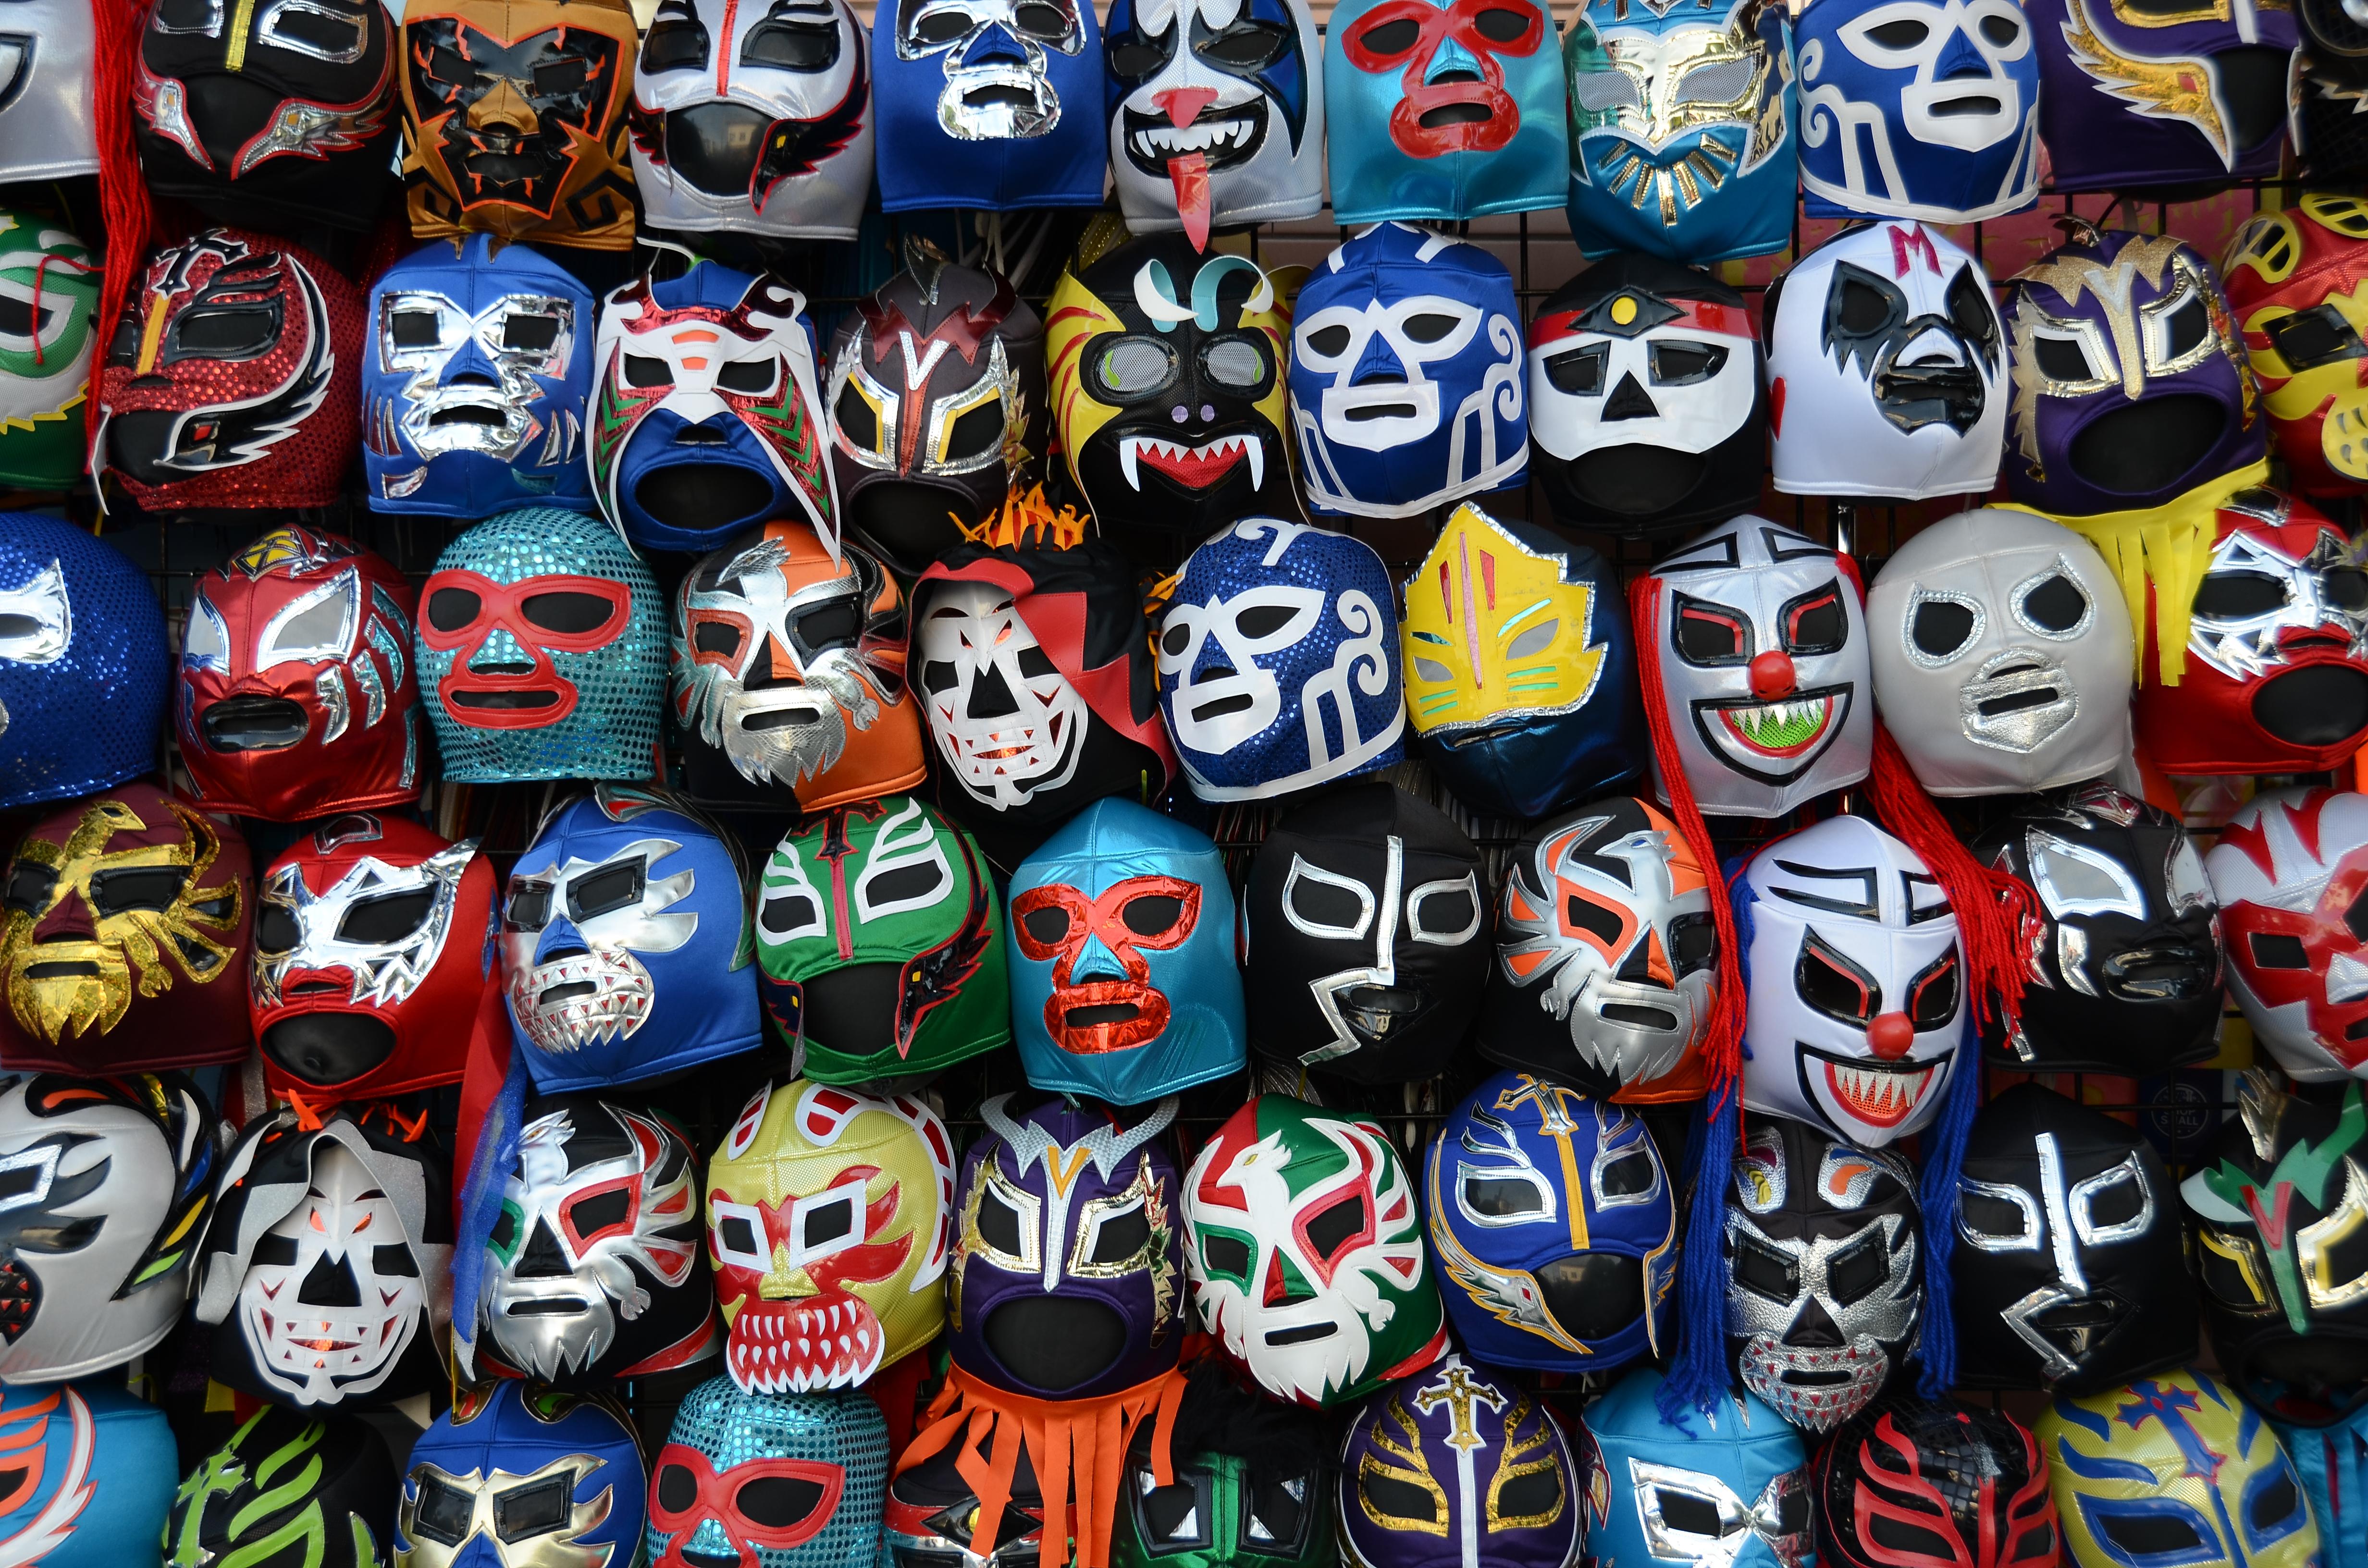 Lucha Libre Masks as Pic